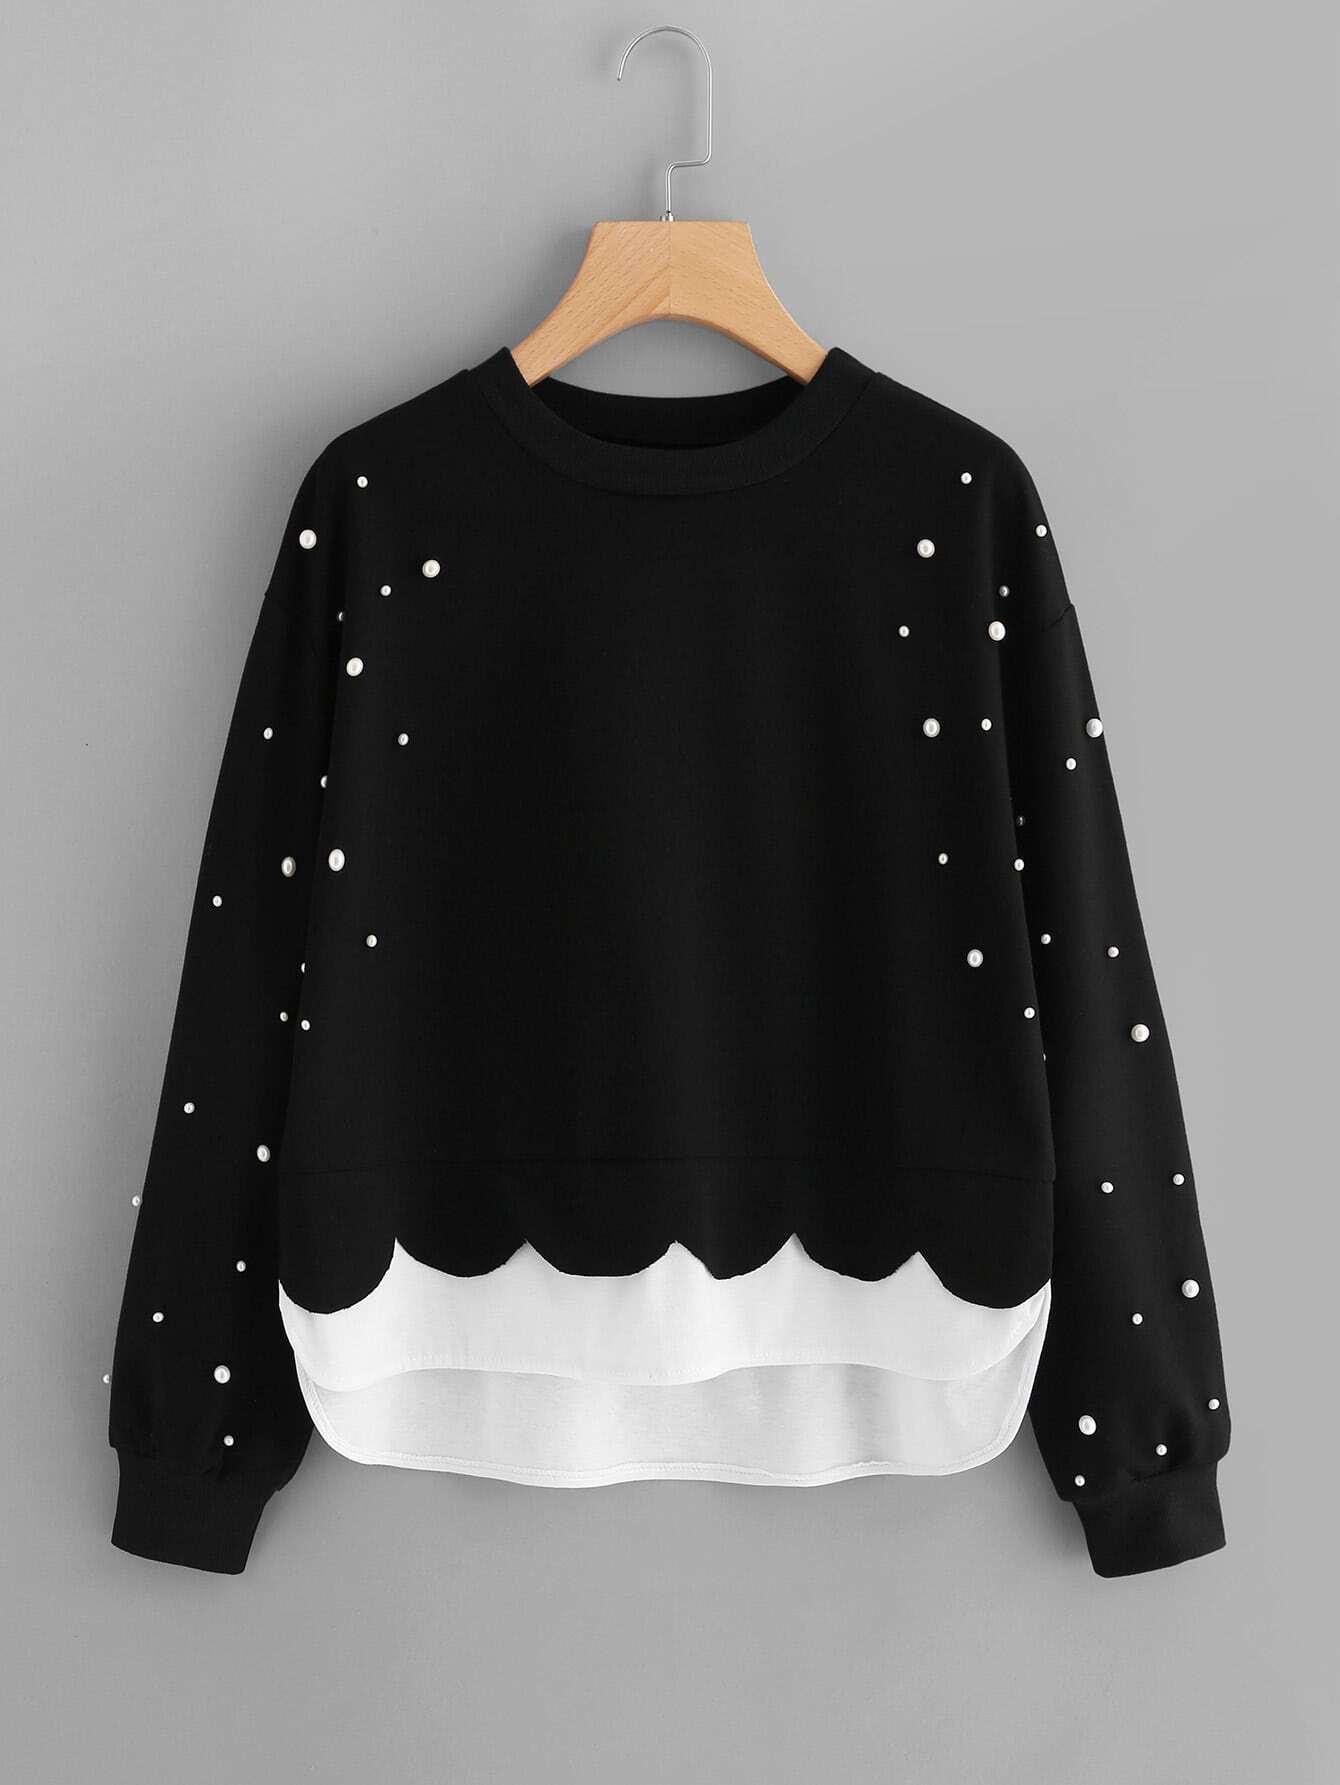 2 In 1 Sweatshirt mit Perlen